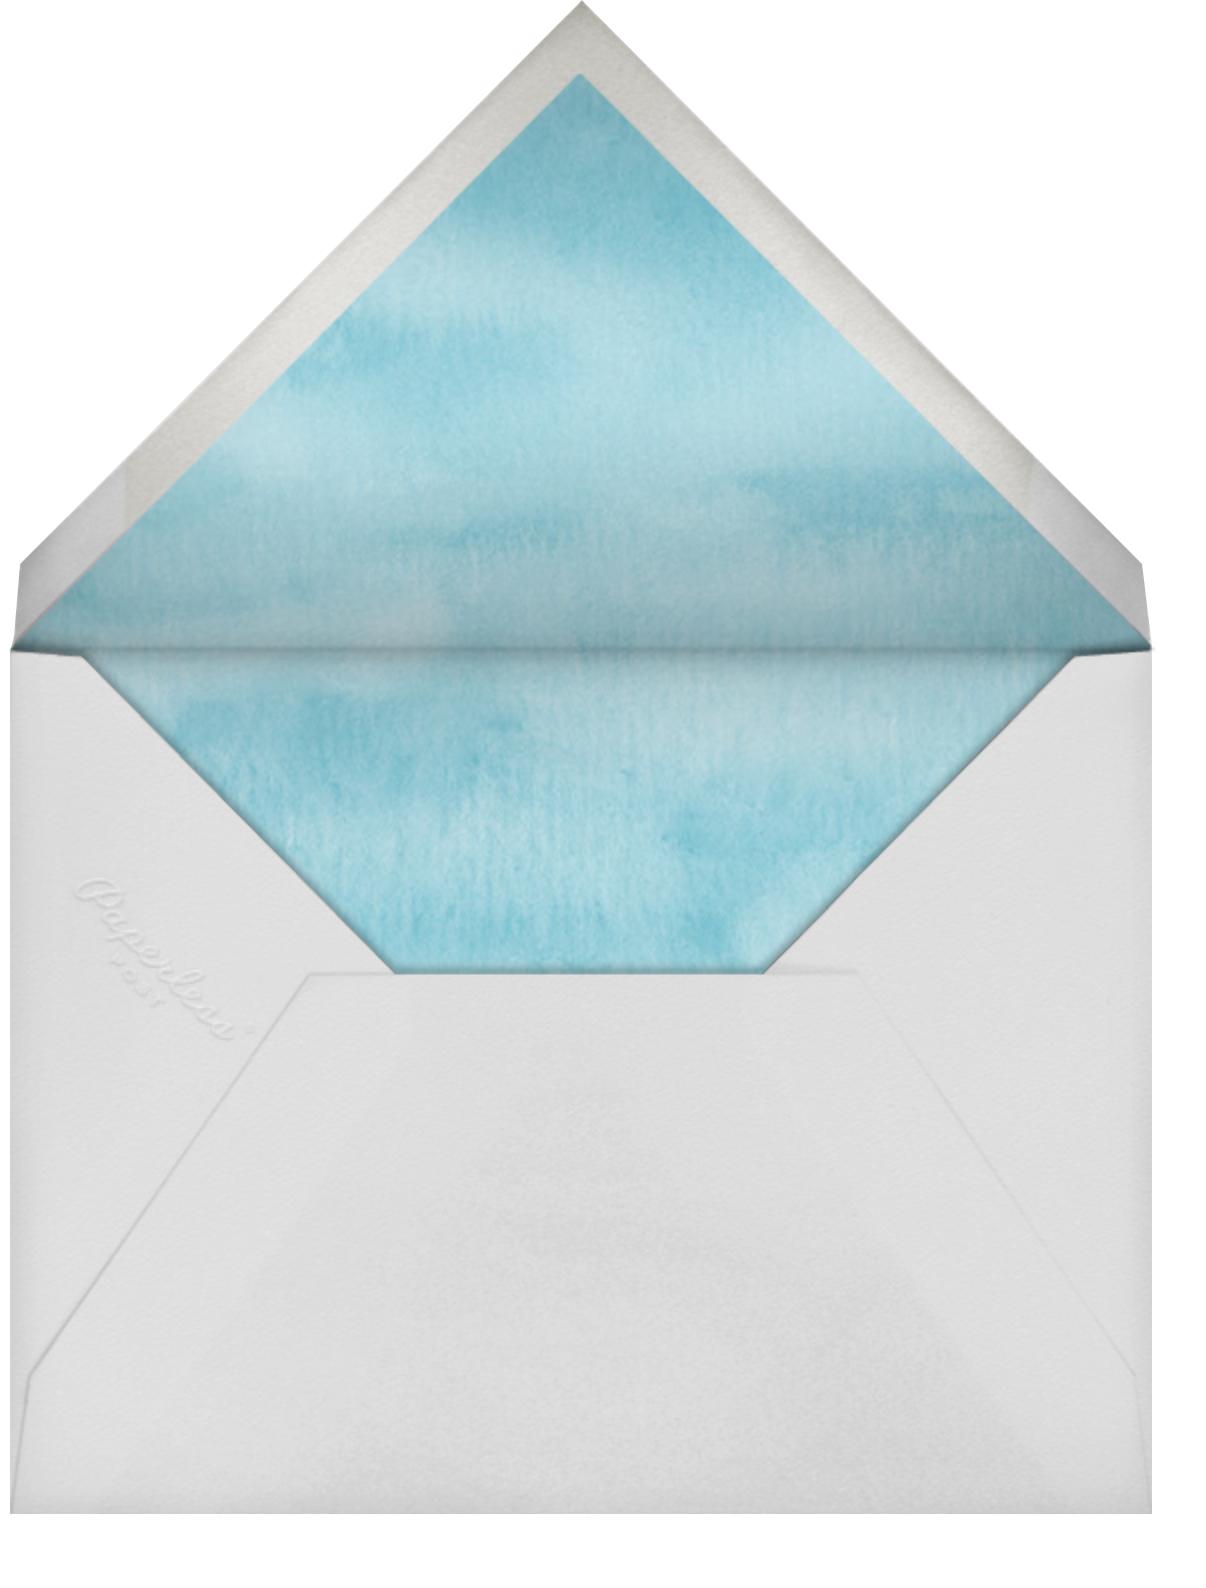 Key West (Invitation) - Felix Doolittle - All - envelope back